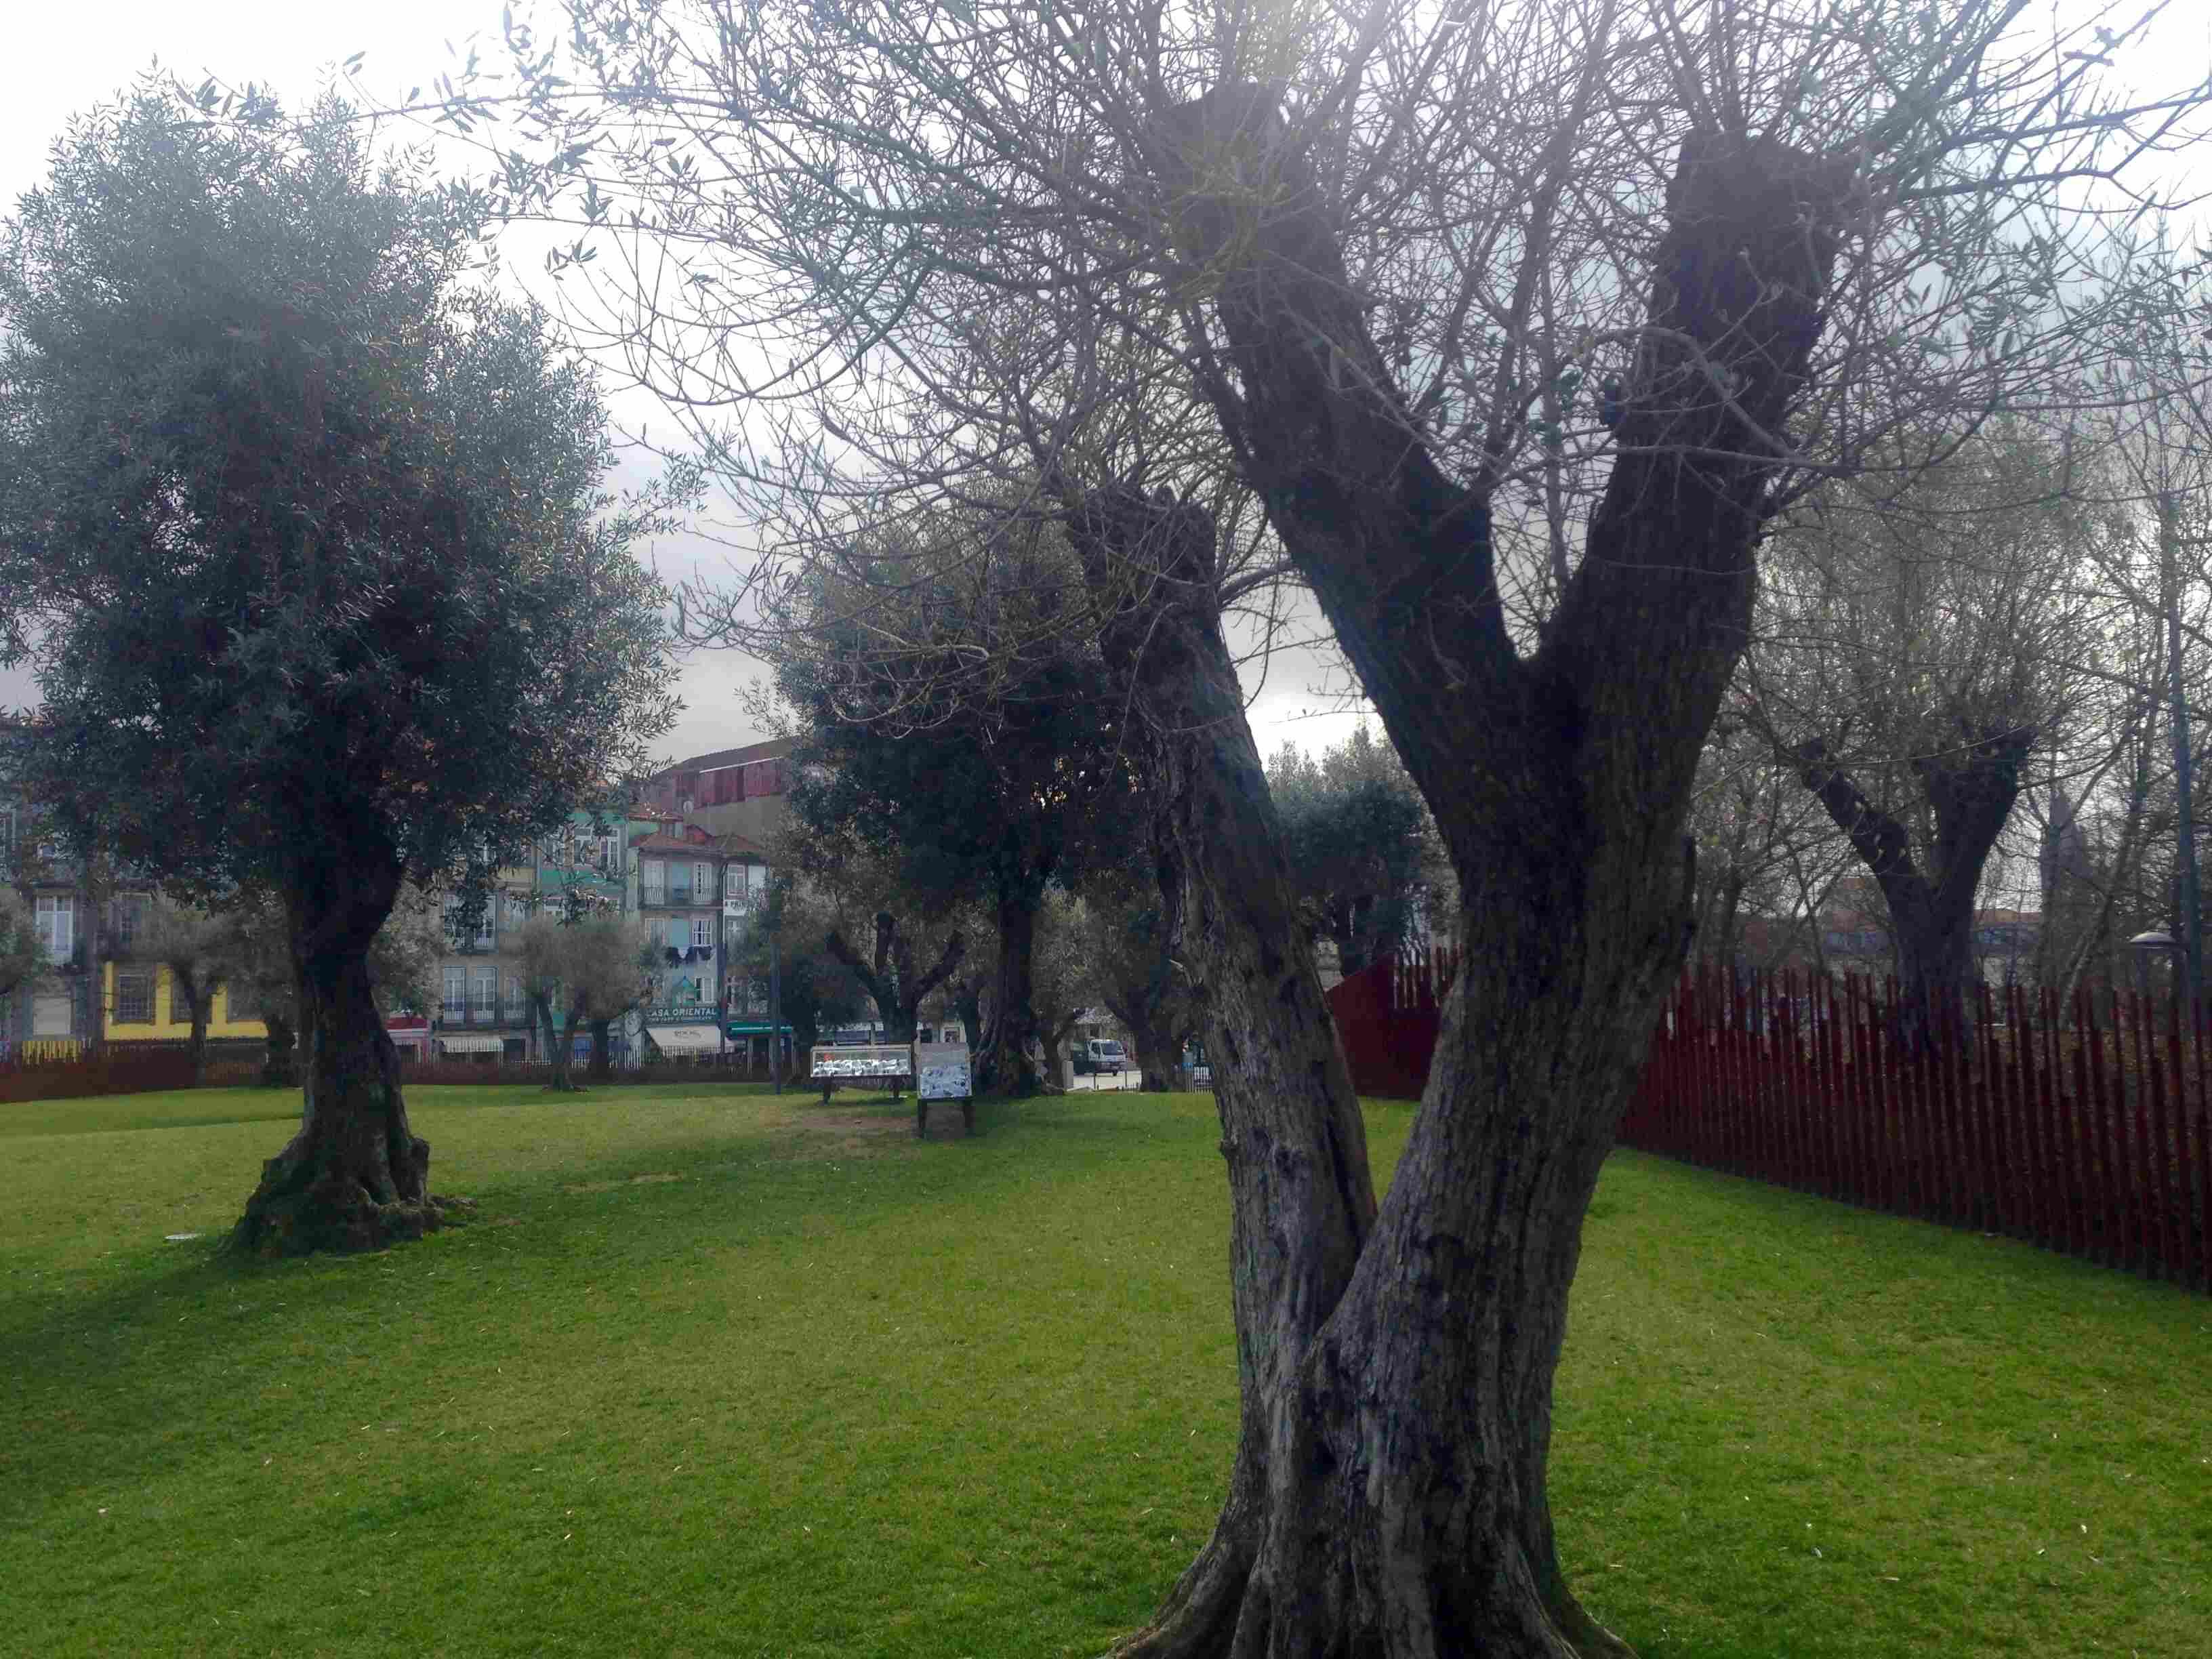 jardim das oliveiras.jpg